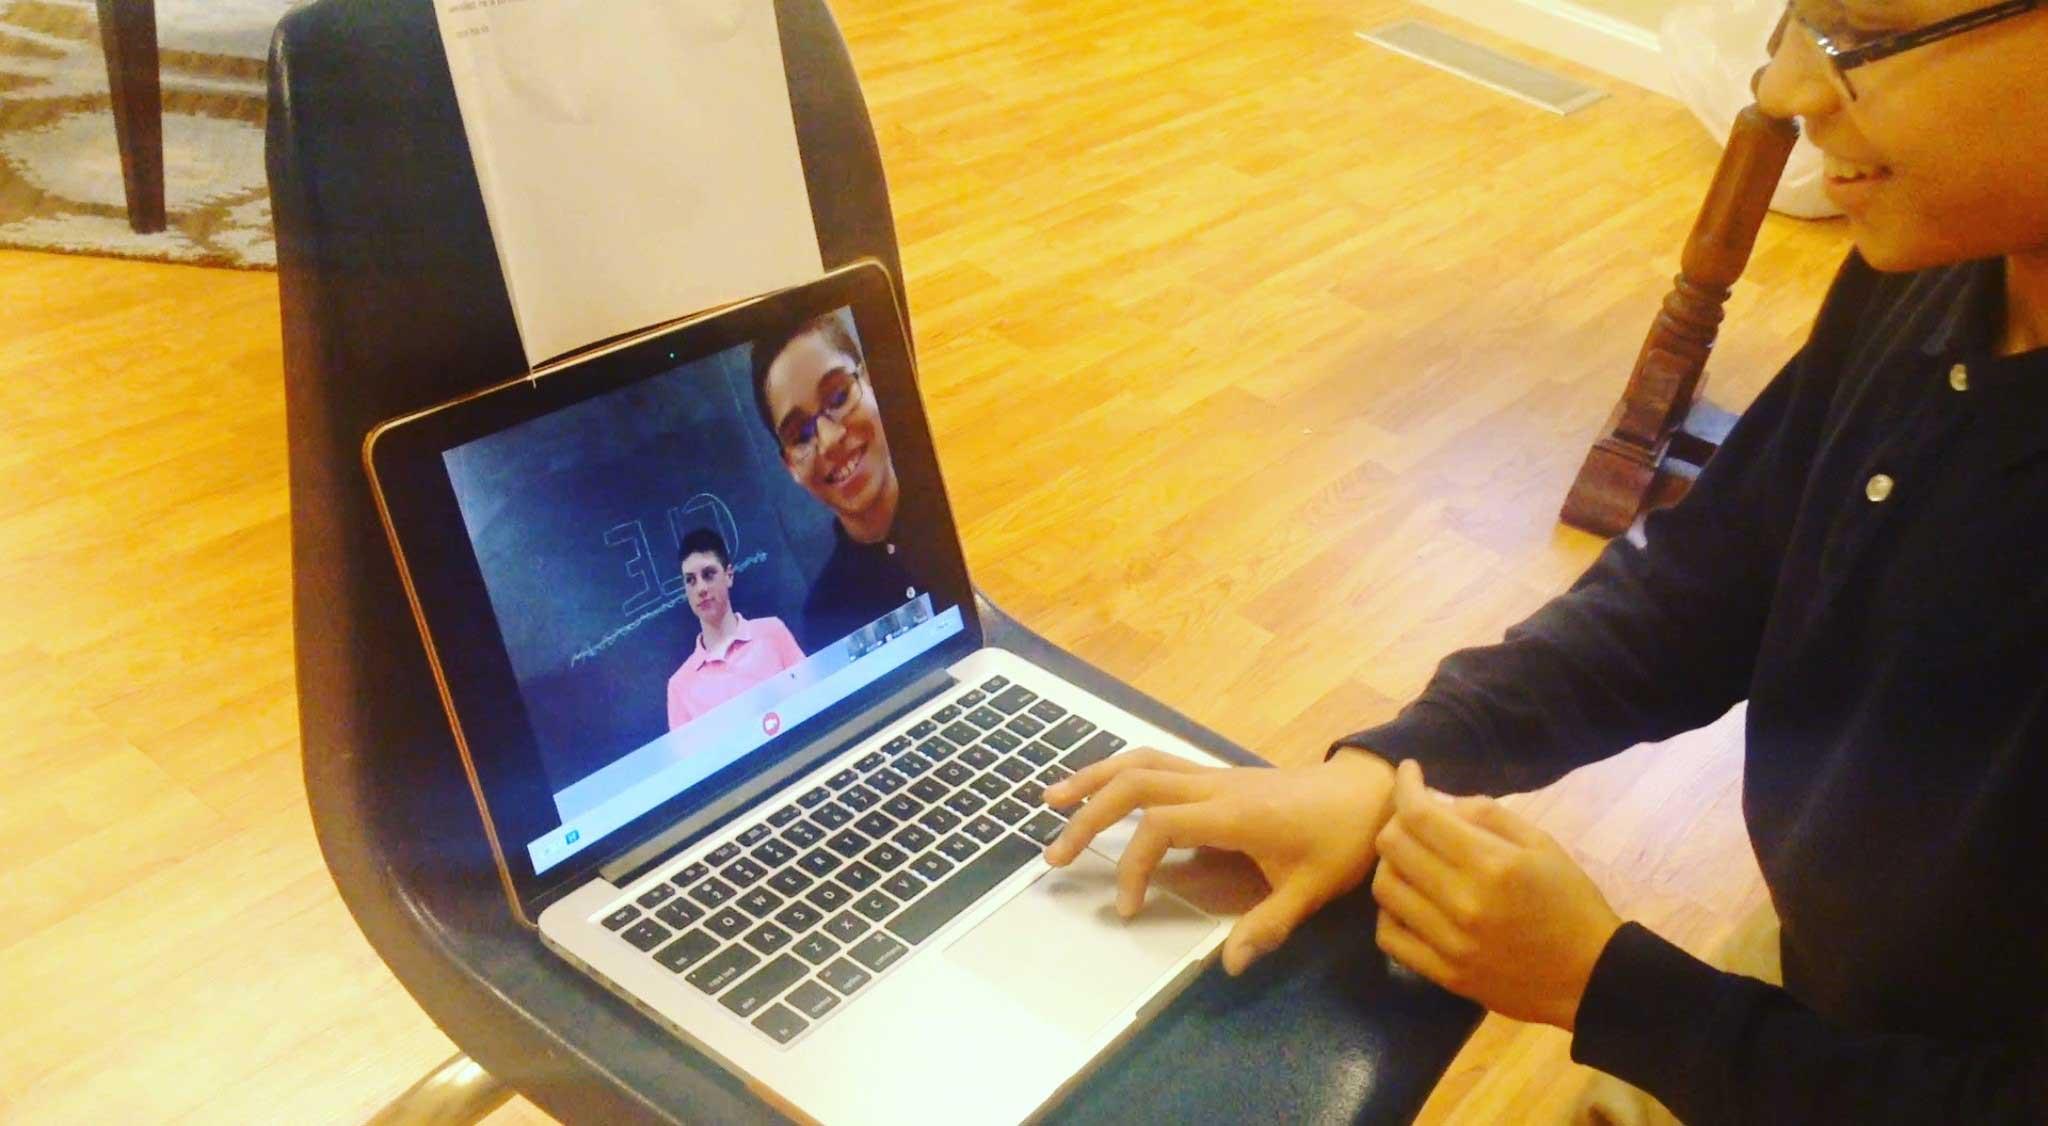 Innovative Classroom History : Bringing history alive through technology collaboration